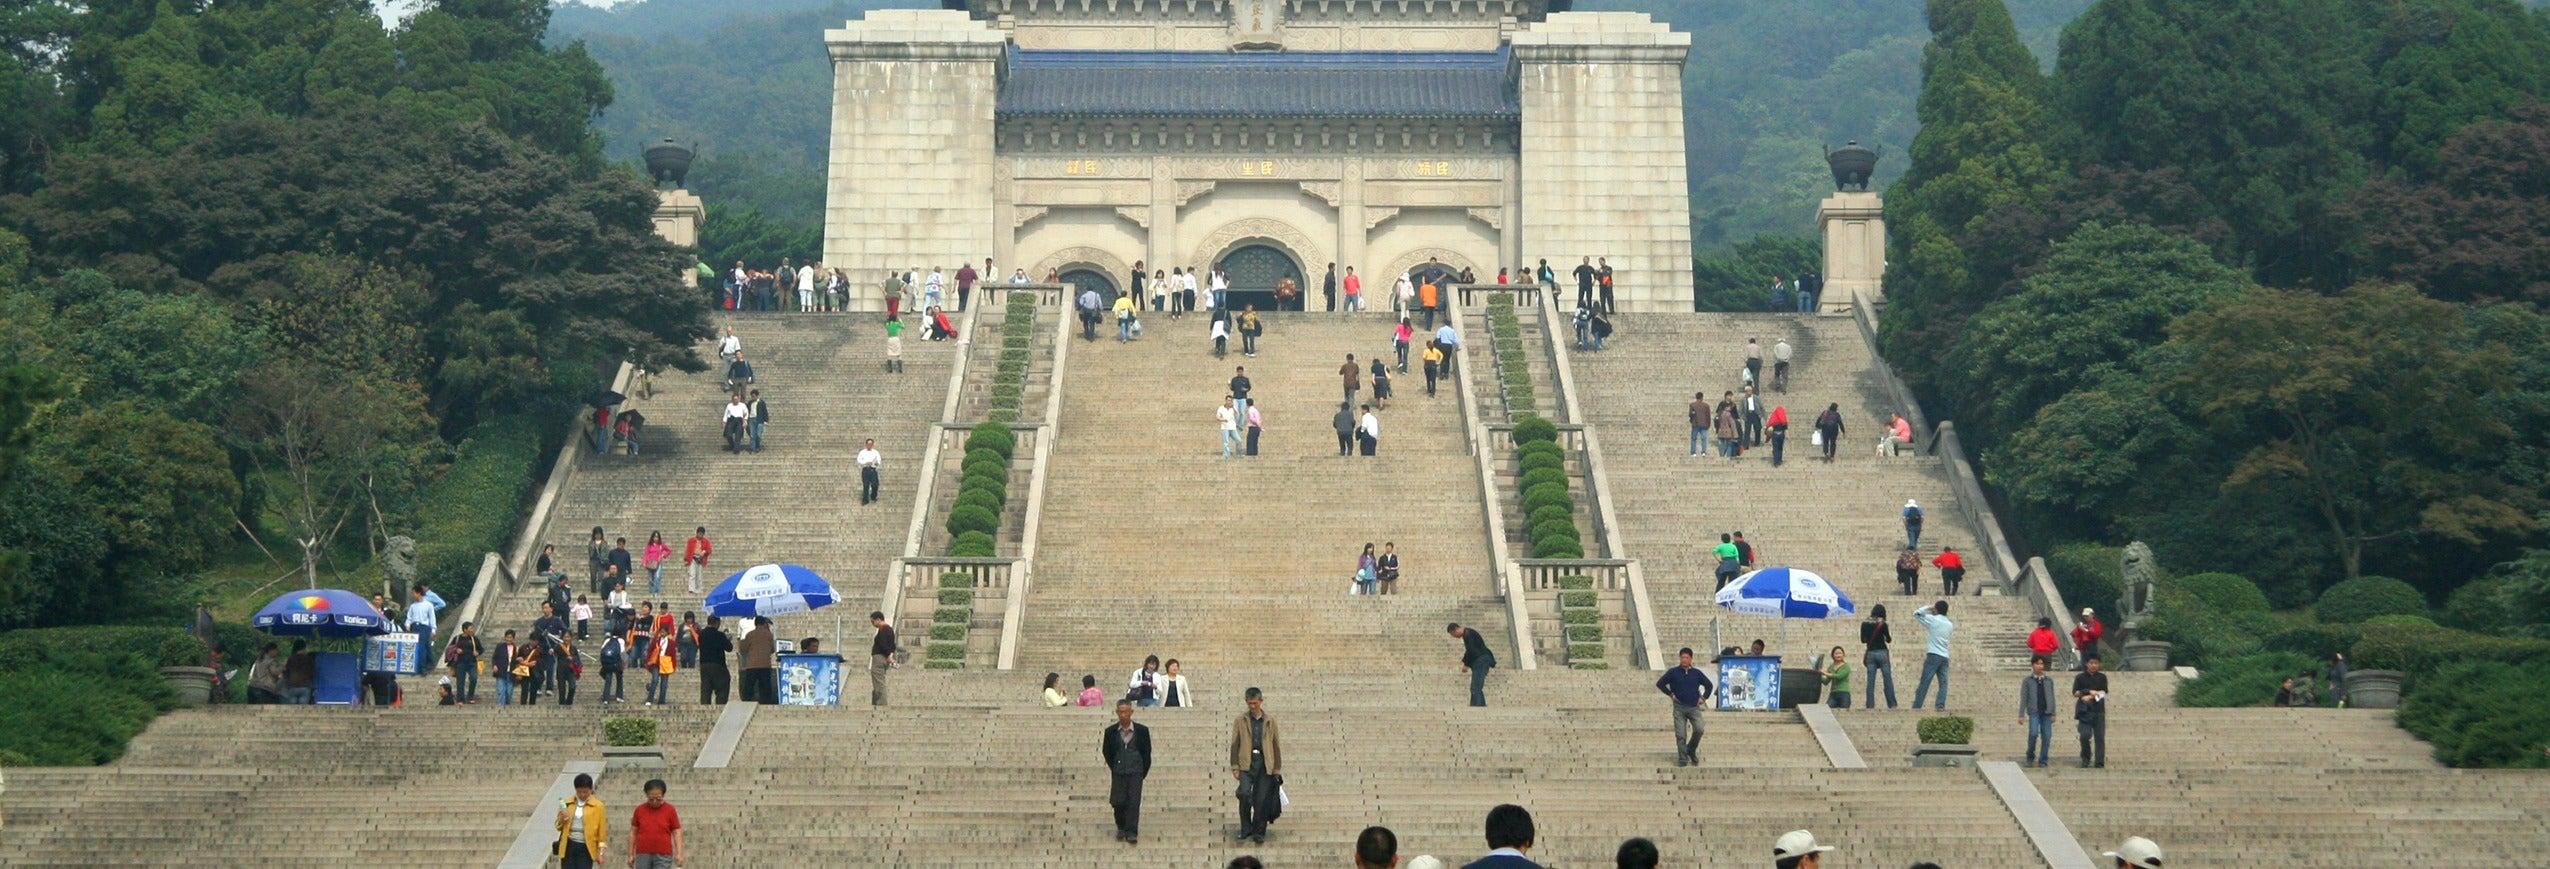 Excursão privada a Nanjing